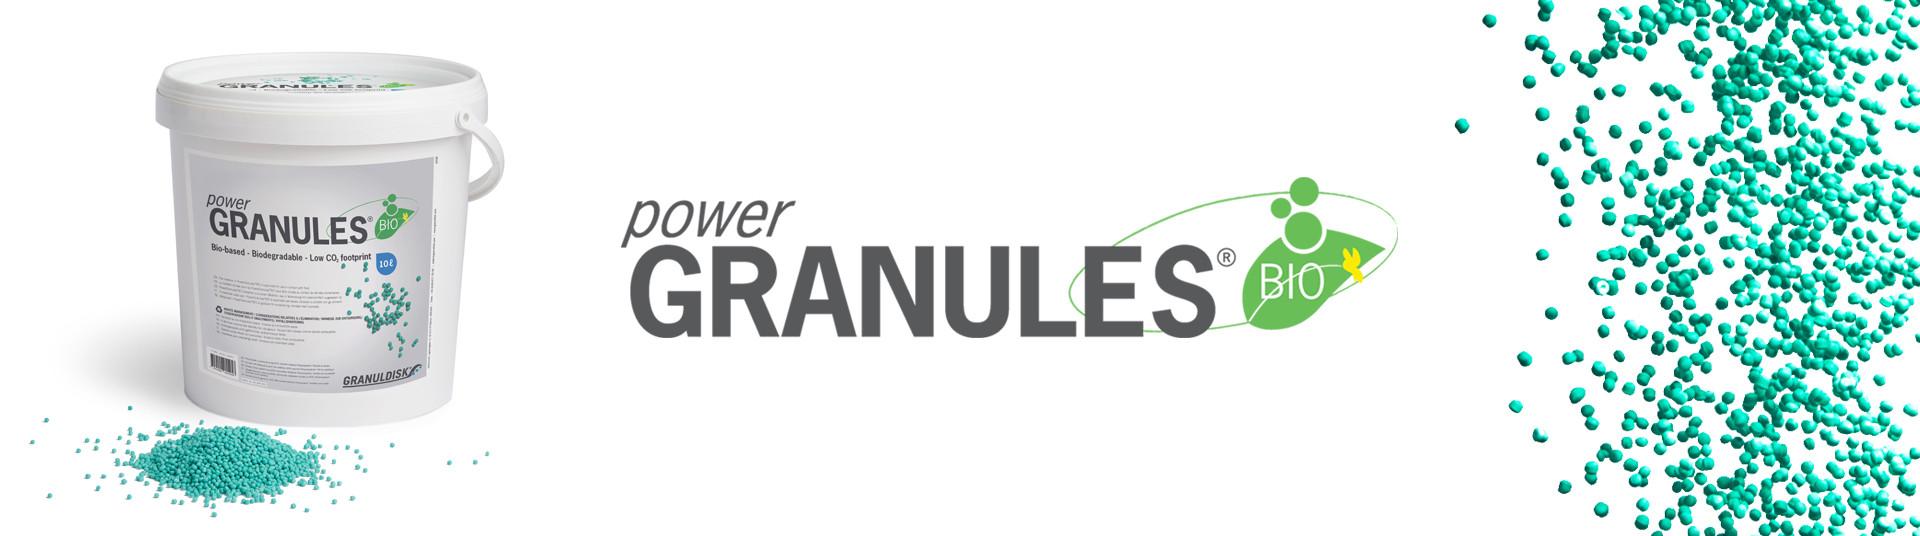 Power Granules